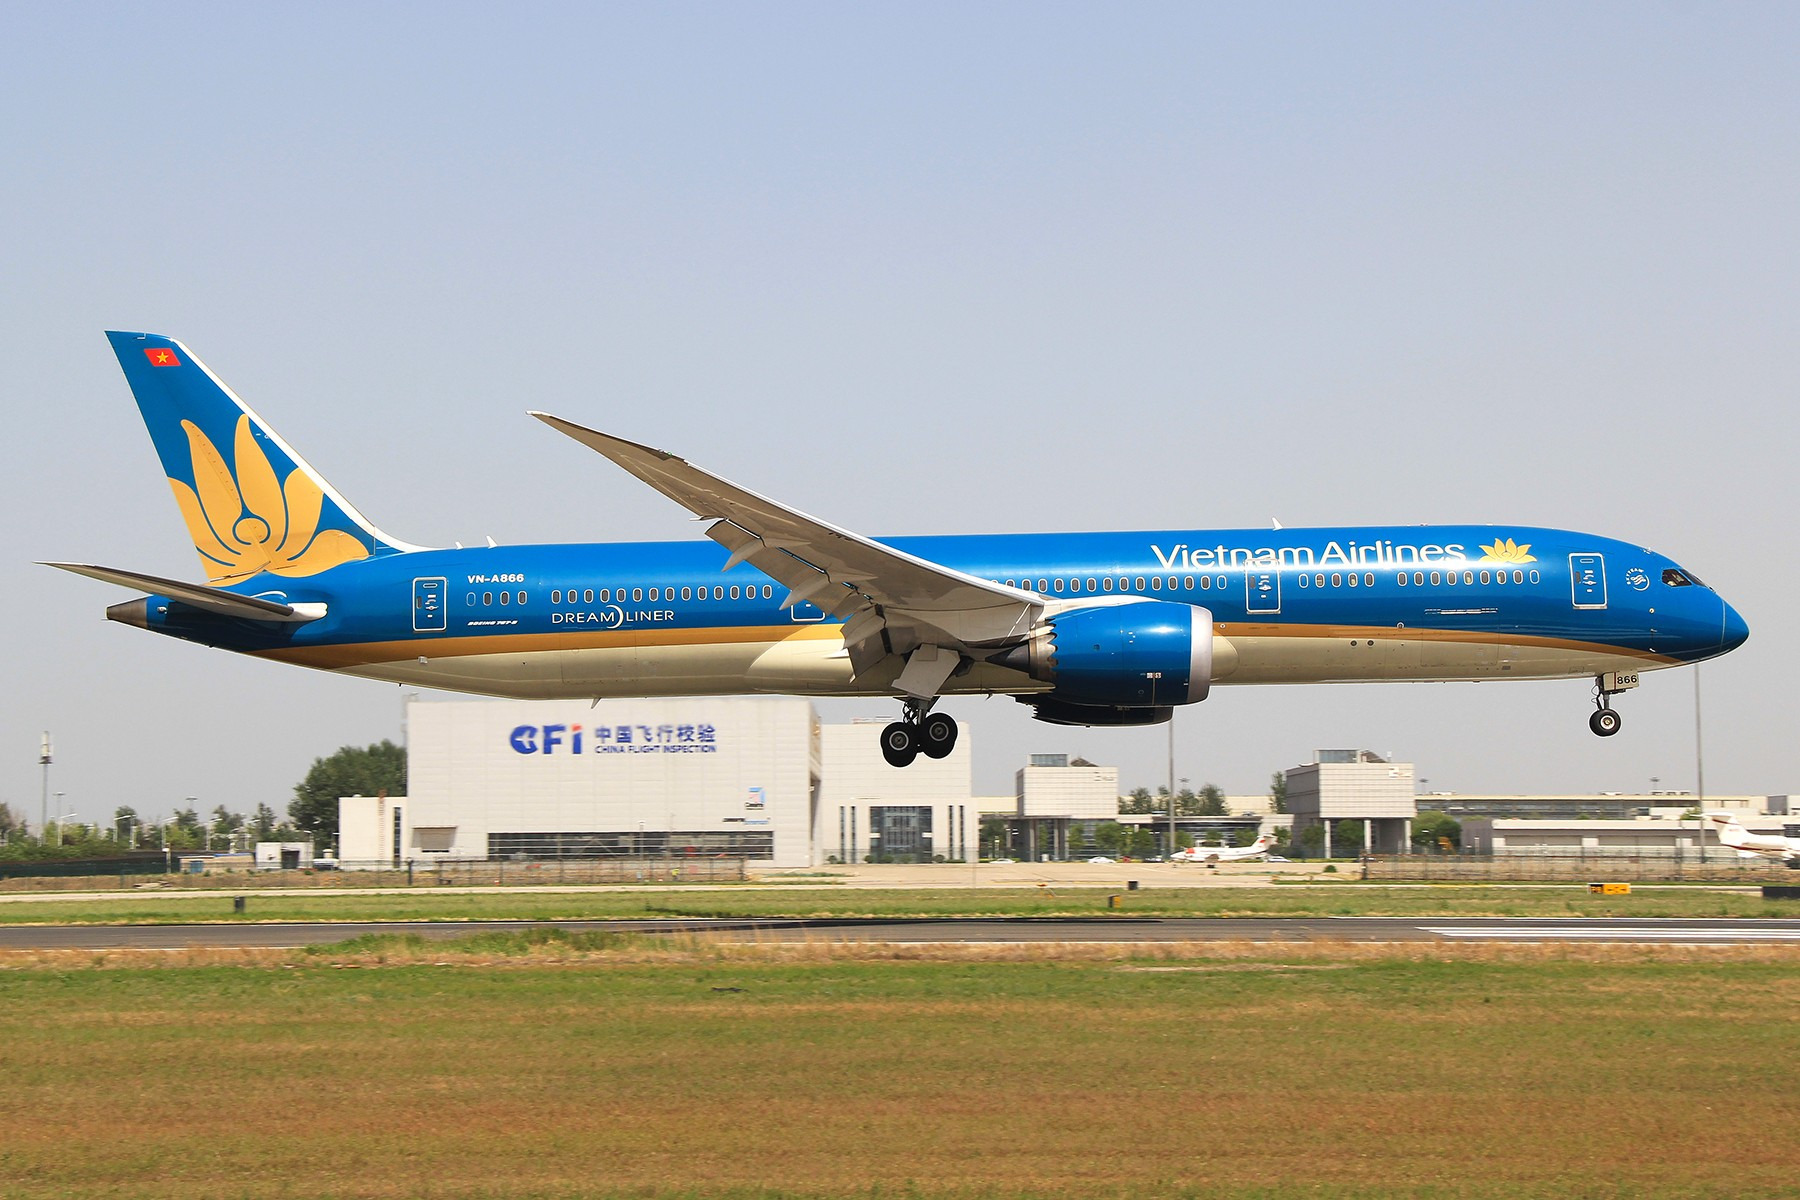 Re:[原创]【PEK】B787-9降落一组 BOEING 787-9 VN-A866 中国北京首都国际机场